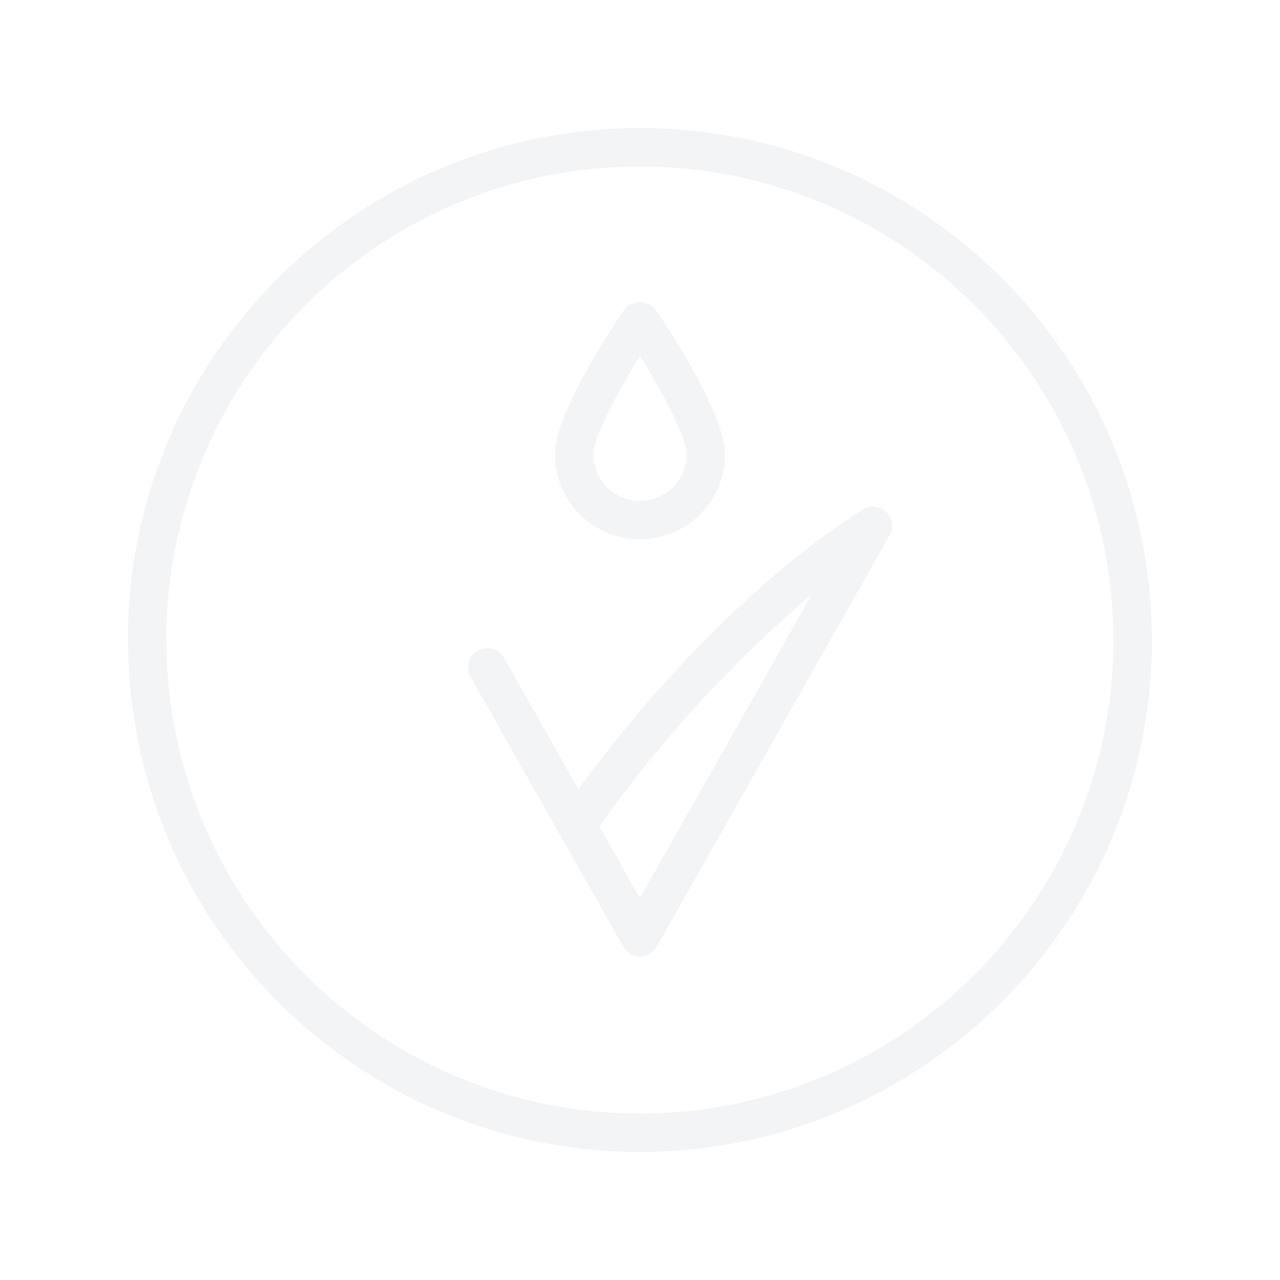 Elizabeth Arden Green Tea Cherry Blossom Eau De Toilette